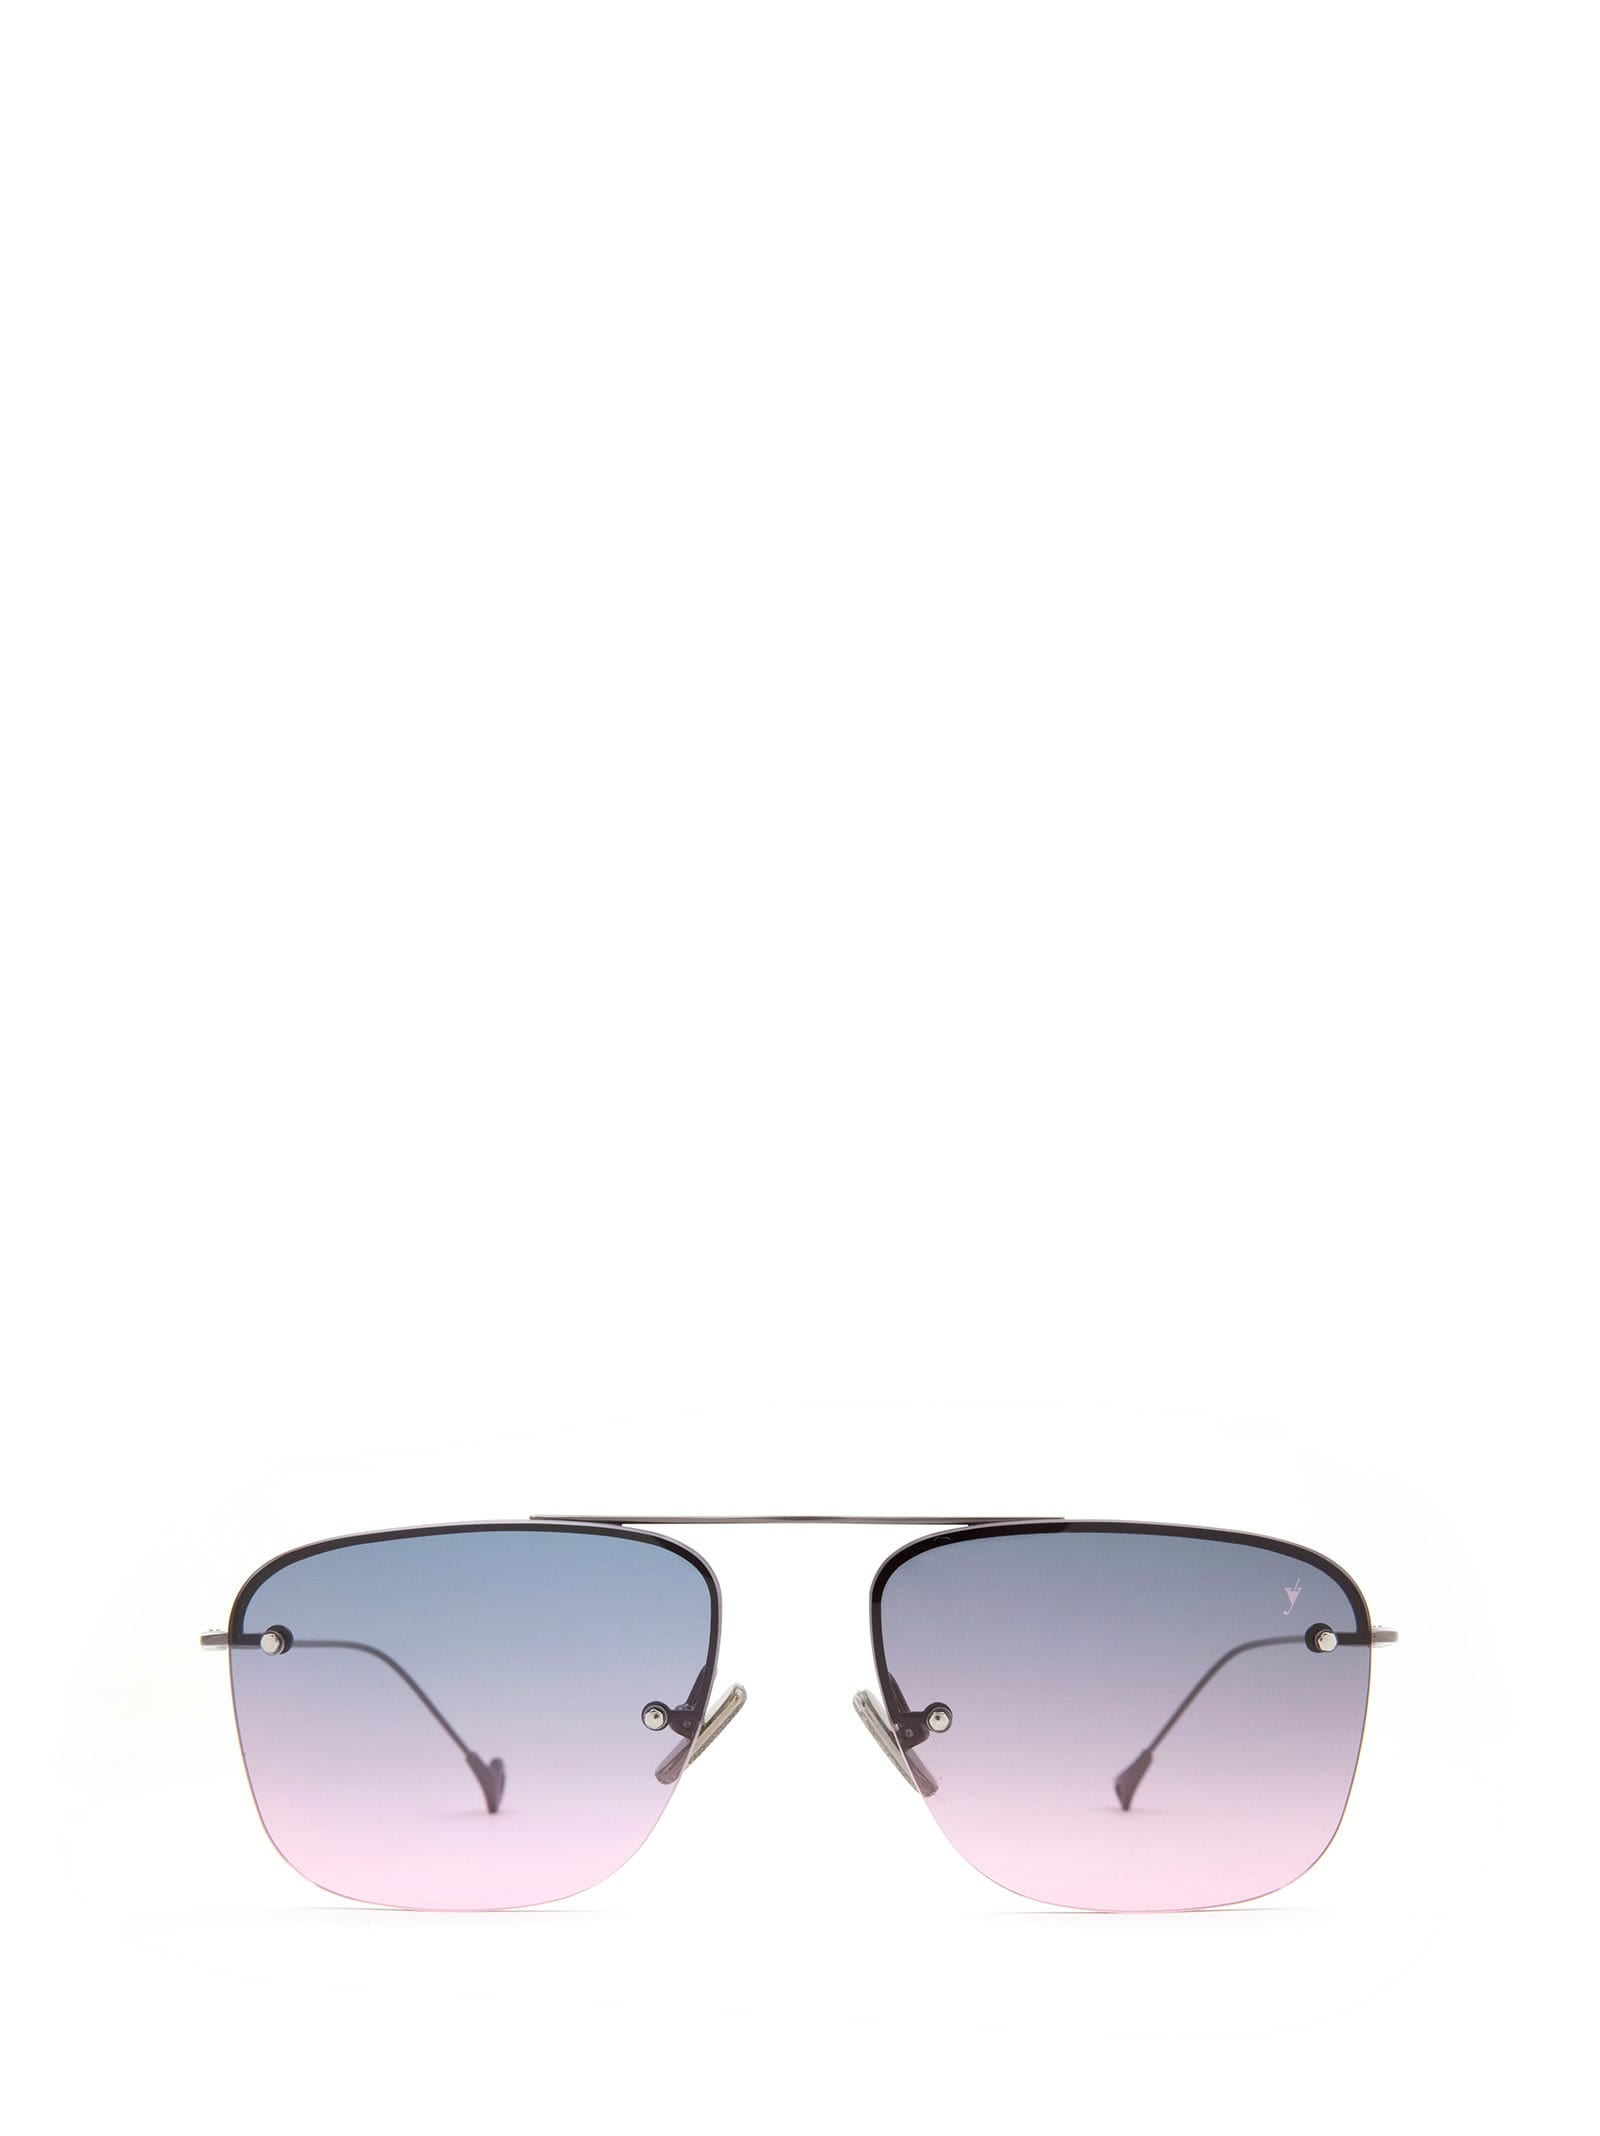 Eyepetizer Eyepetizer Palmer C 3-20 Sunglasses